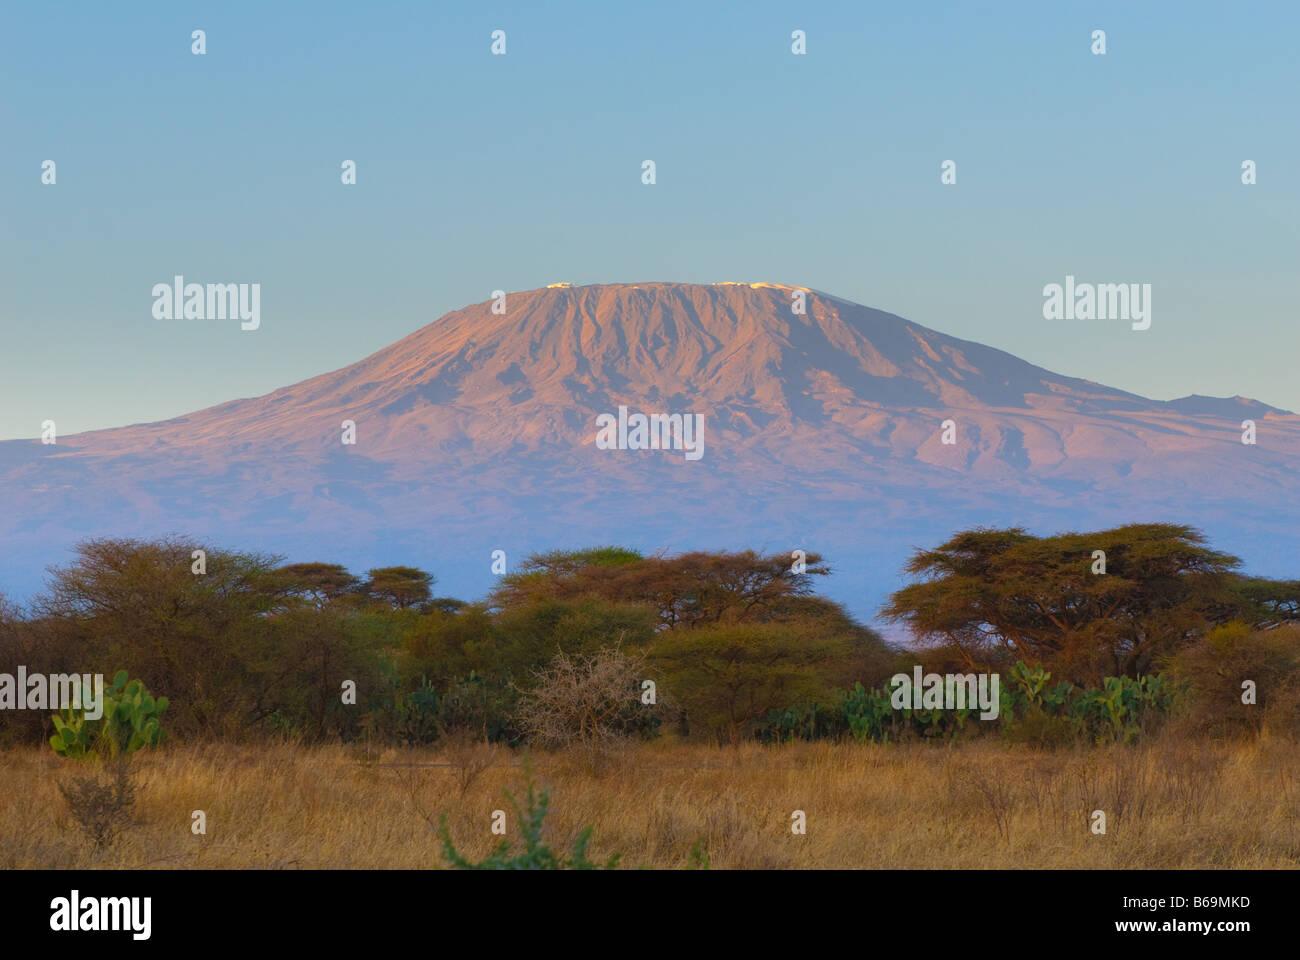 kilimanjaro mountain in the sunrise - Stock Image